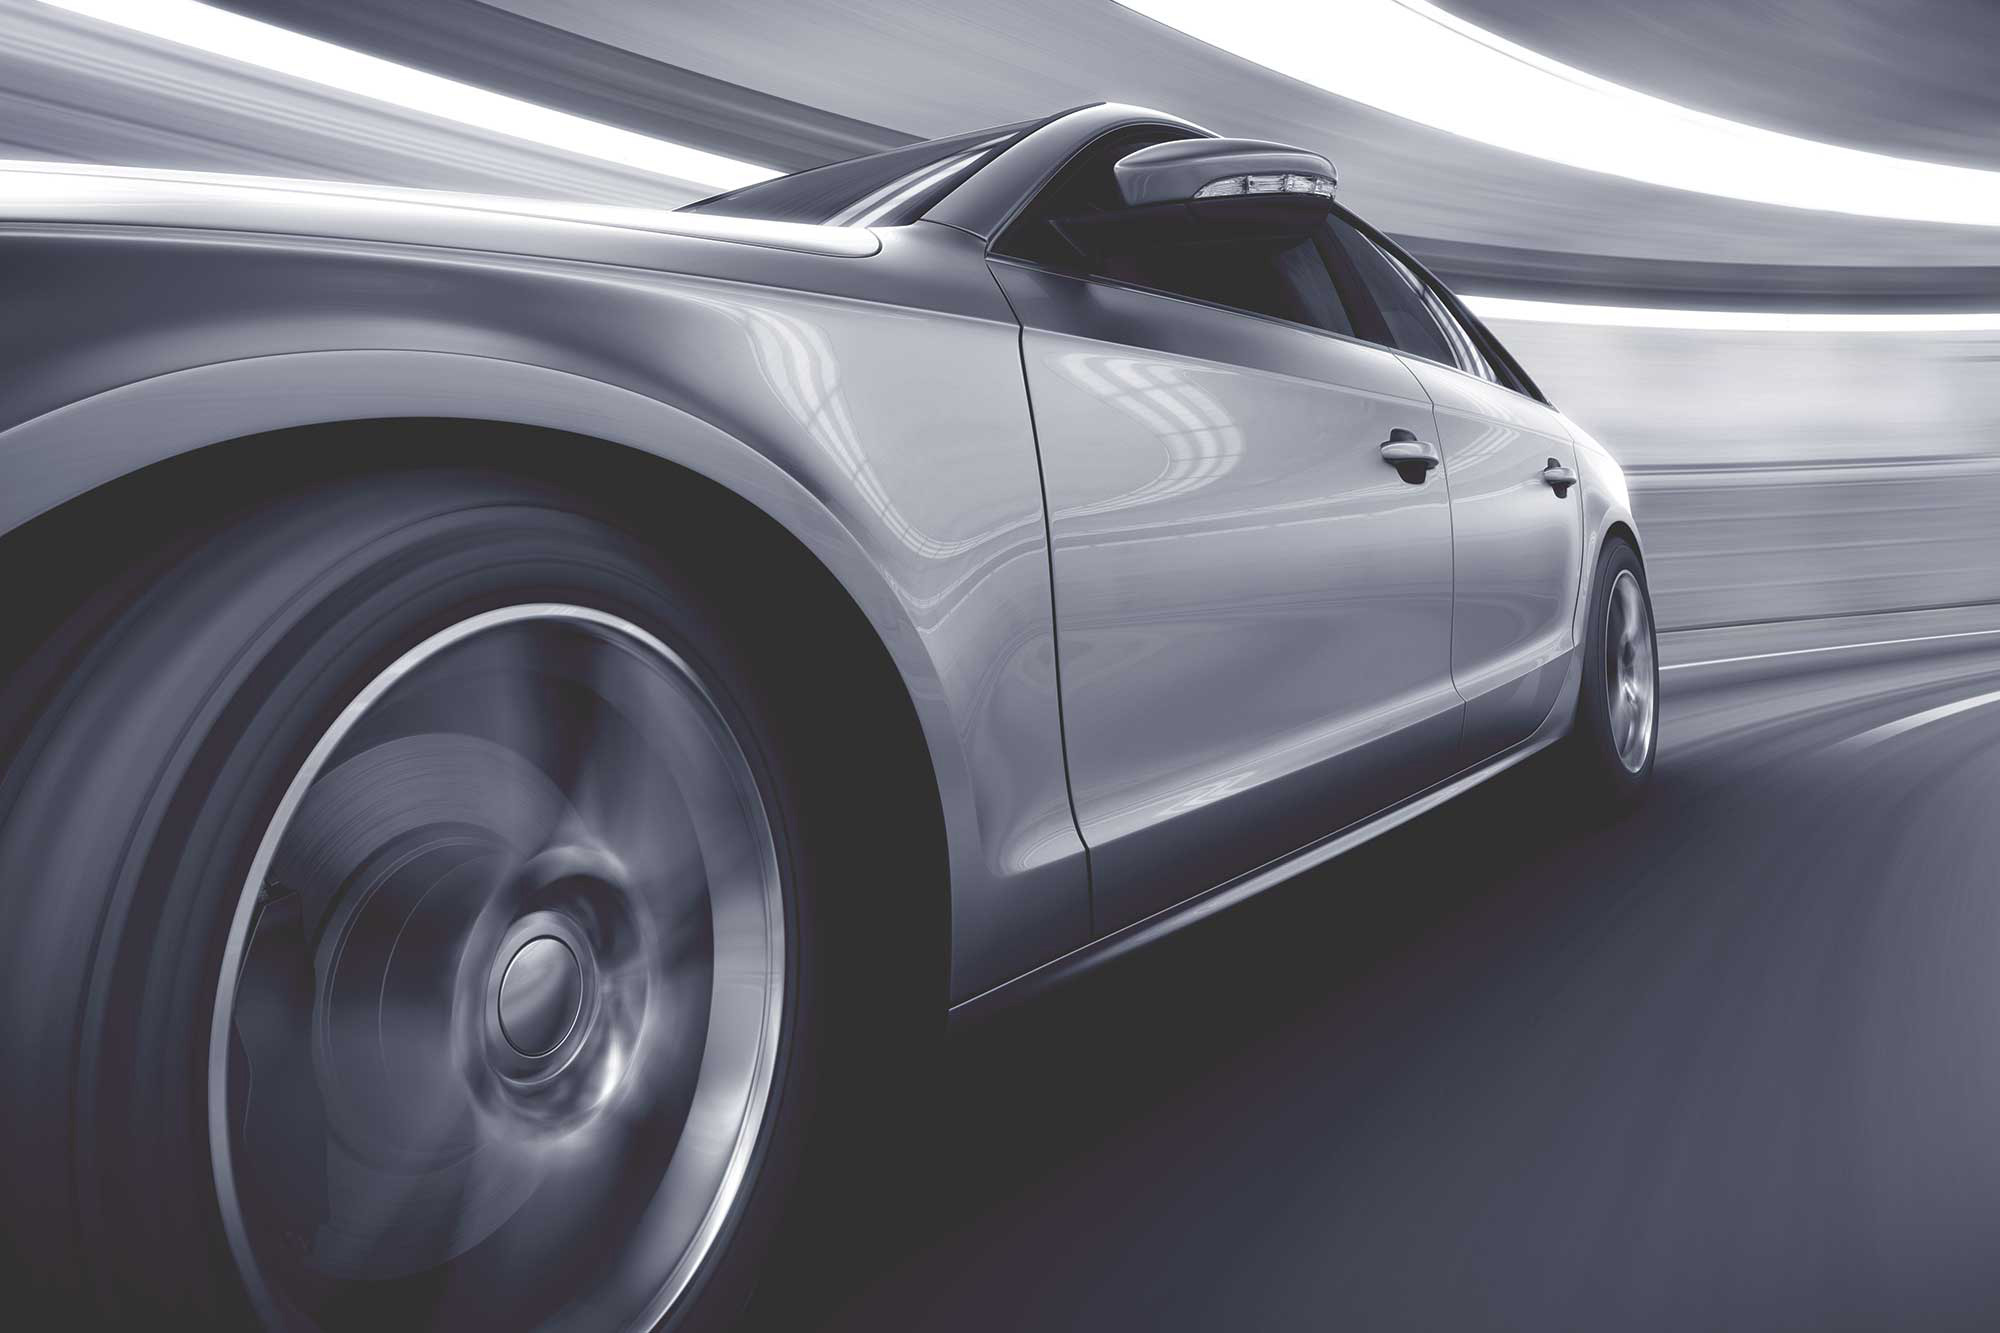 Viper Pro Ice Car Alarm Wiring Diagram Track Installation Tools